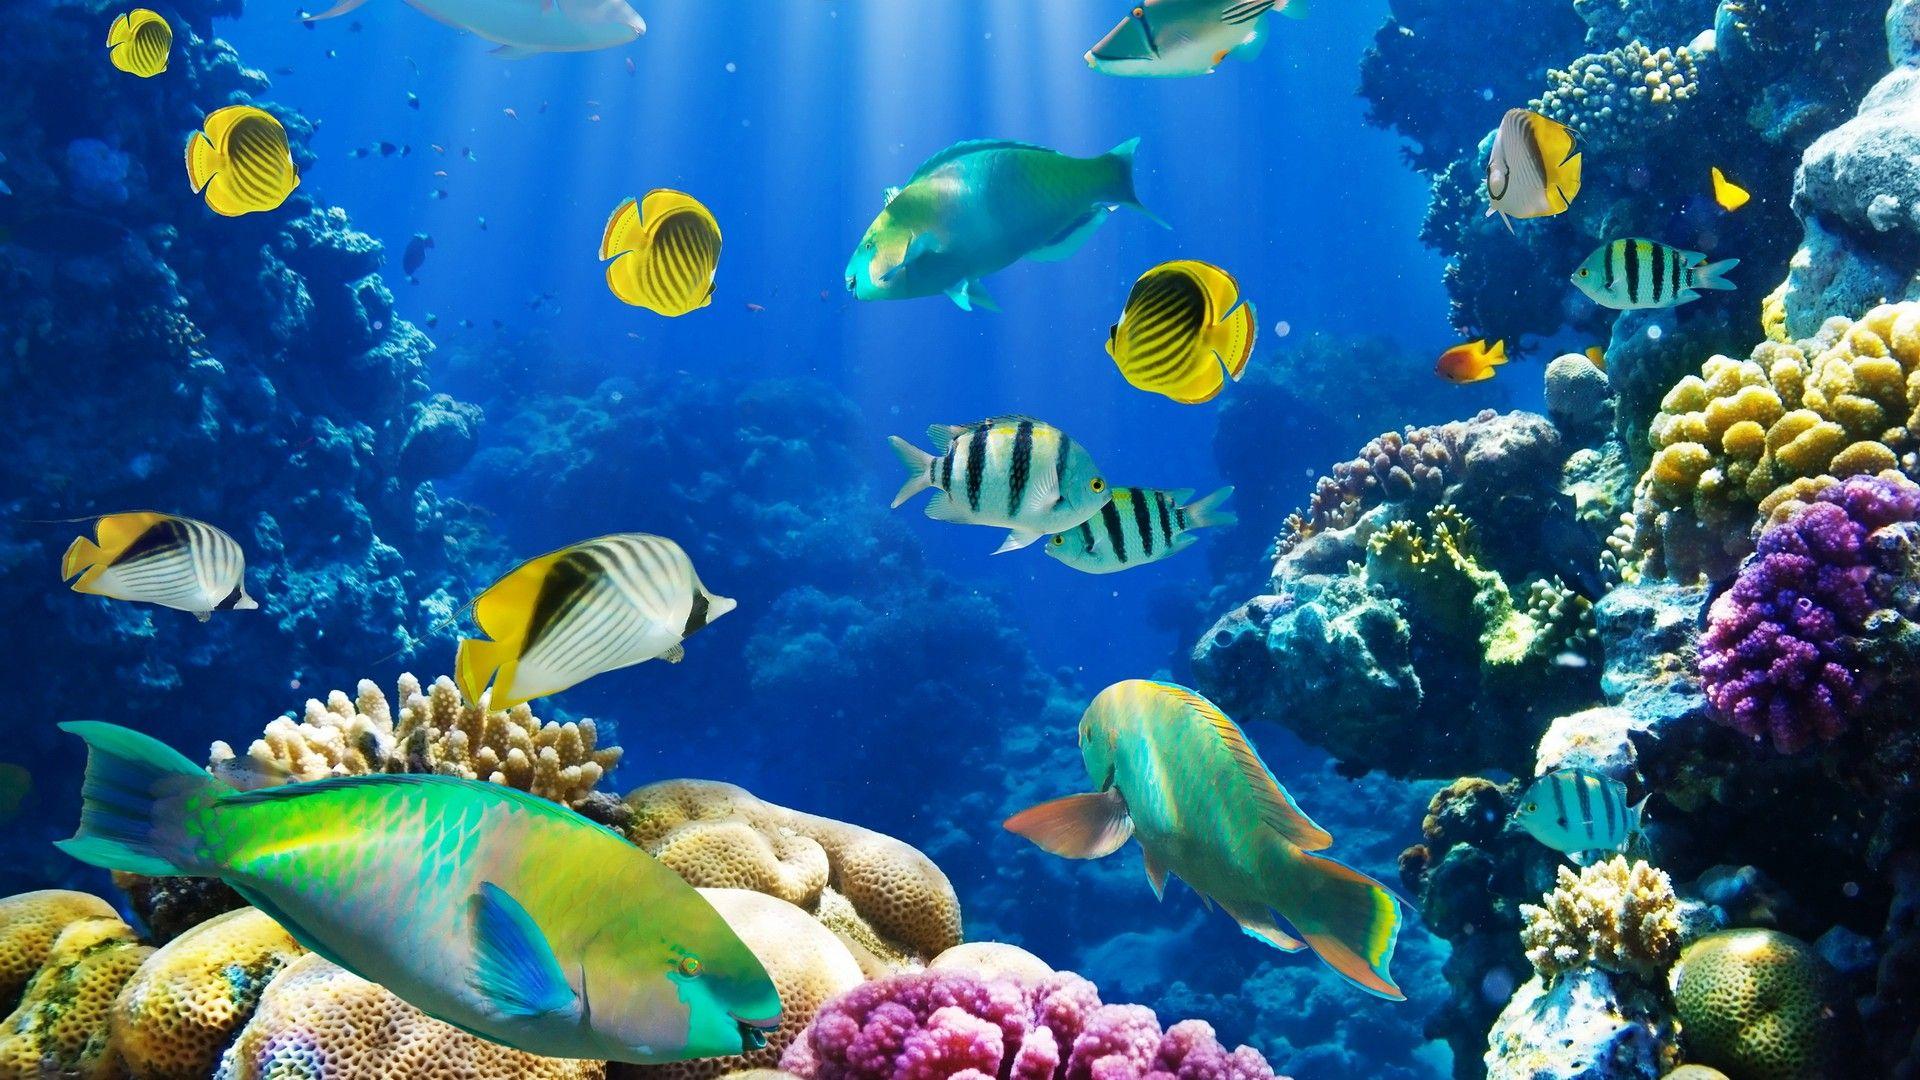 Nature Coral Fish Hd Wallpaper Fish Wallpaper Fish Background Tropical Fish Aquarium